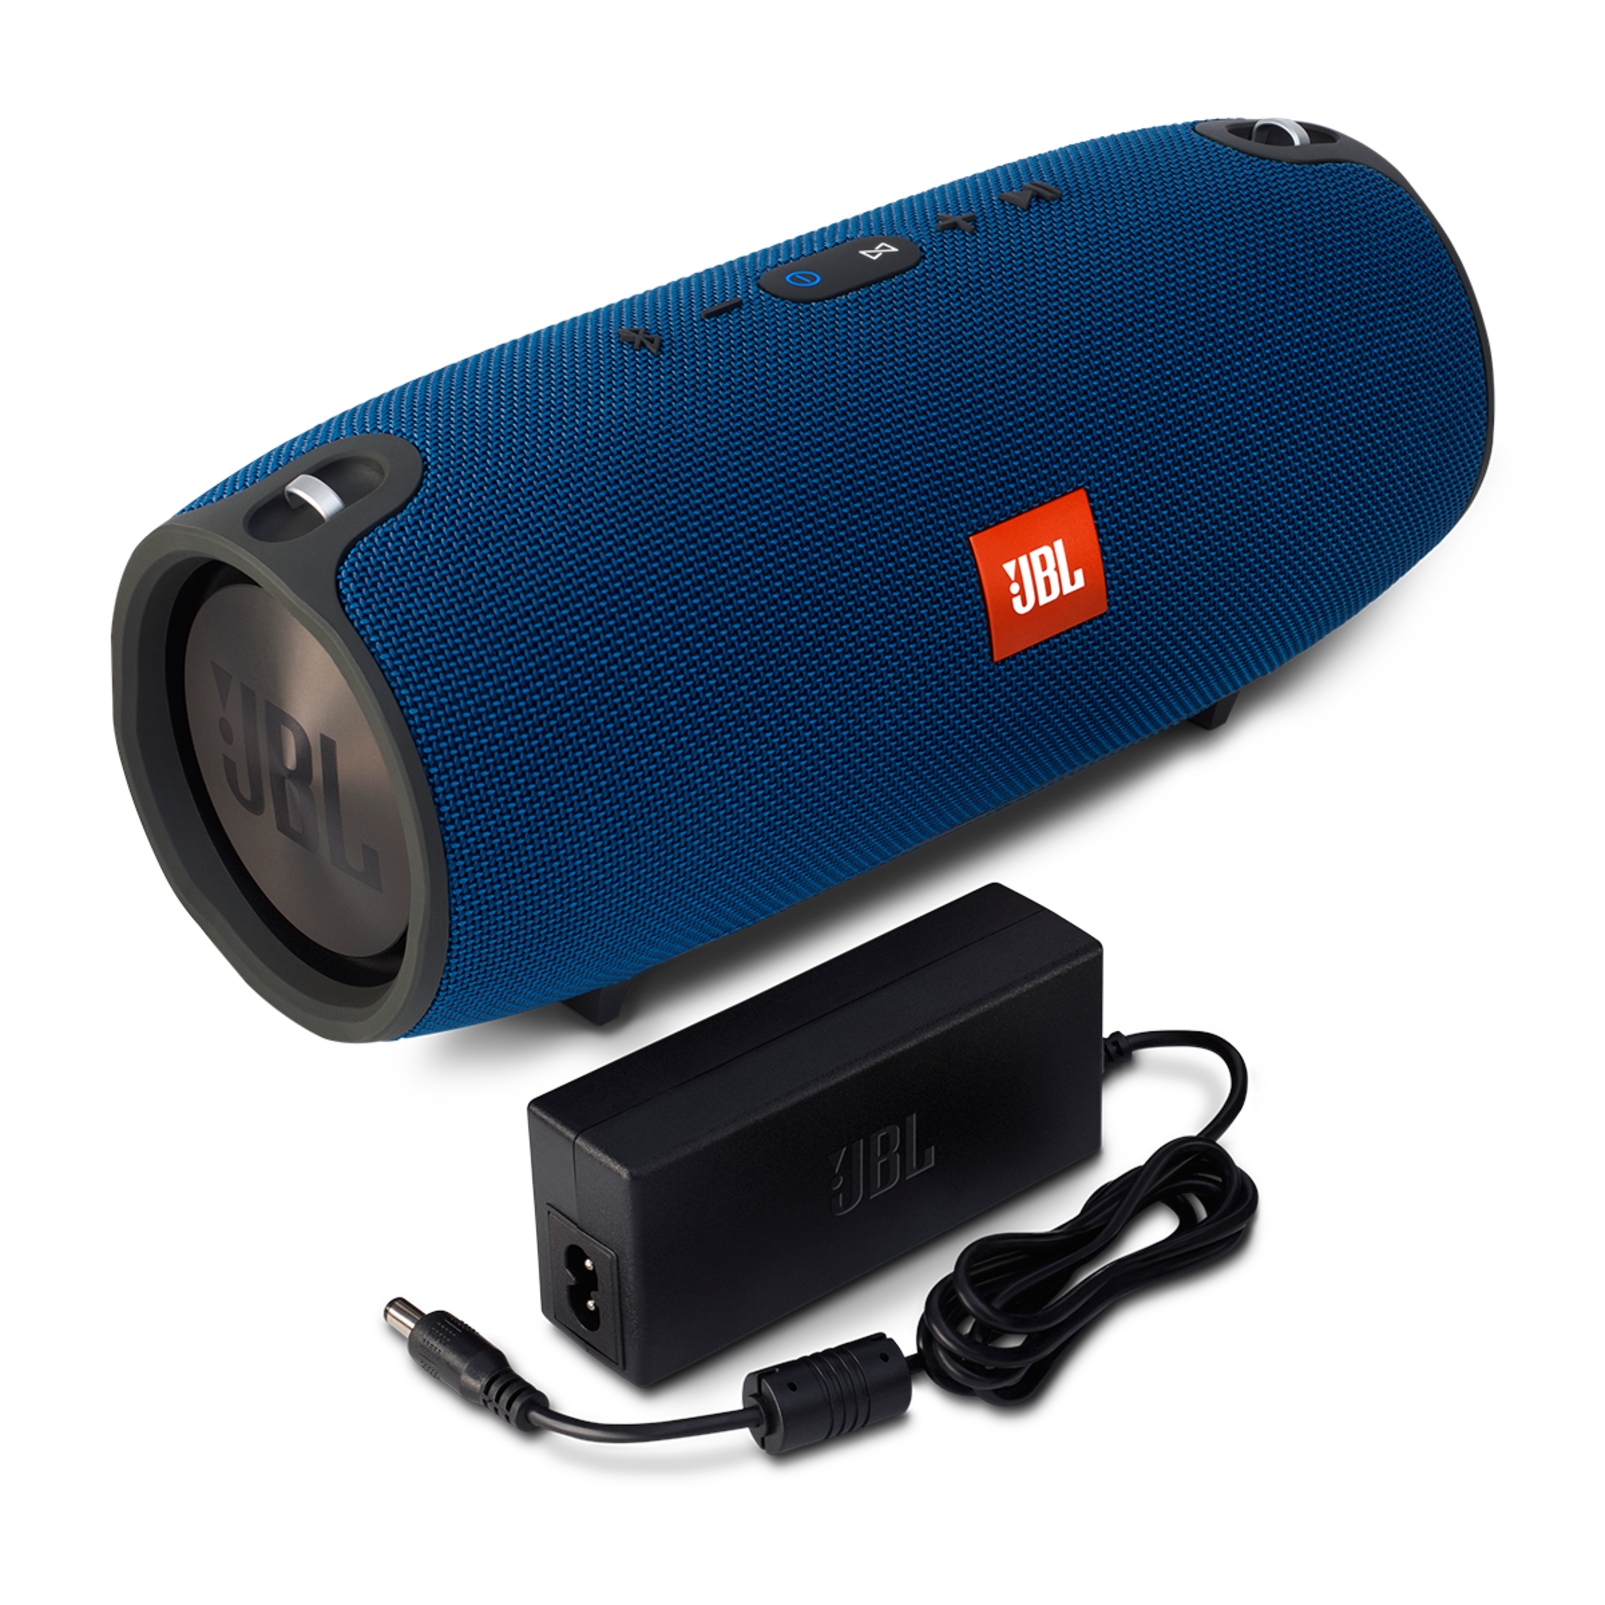 JBL Xtreme - Blue - Splashproof portable speaker with ultra-powerful performance - Detailshot 1